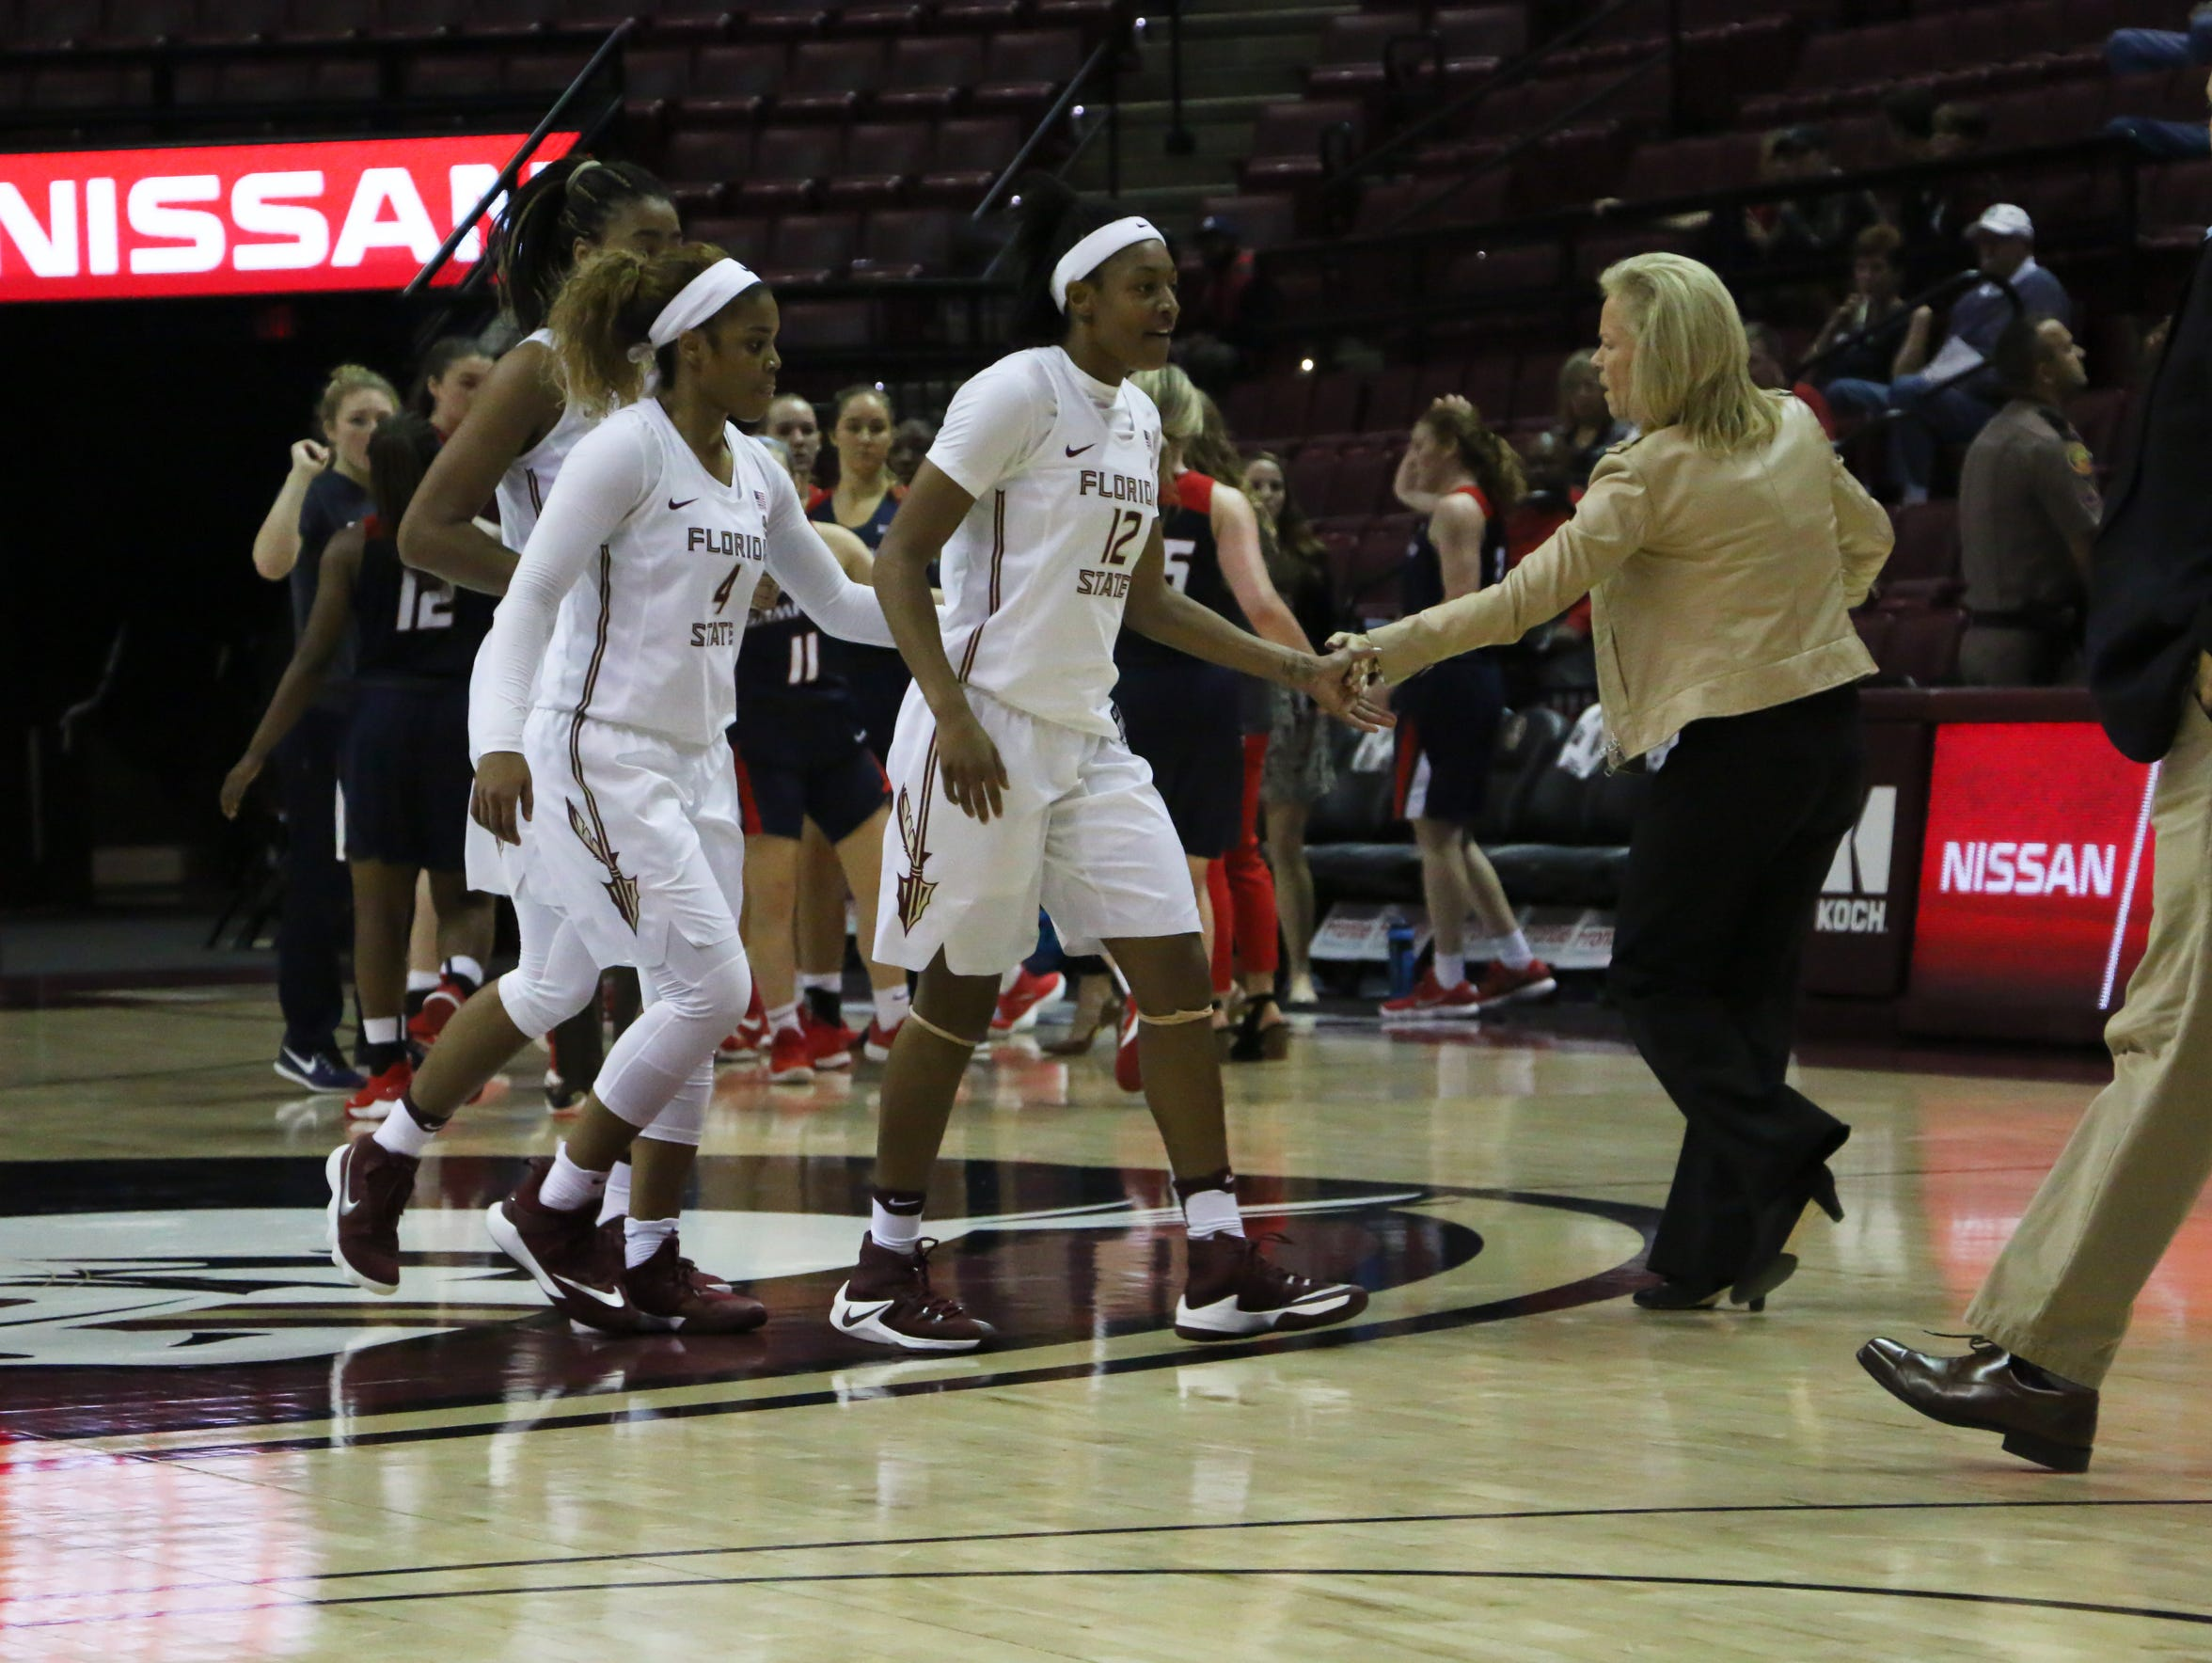 FSU women's basketball coach Sue Semrau congratulating